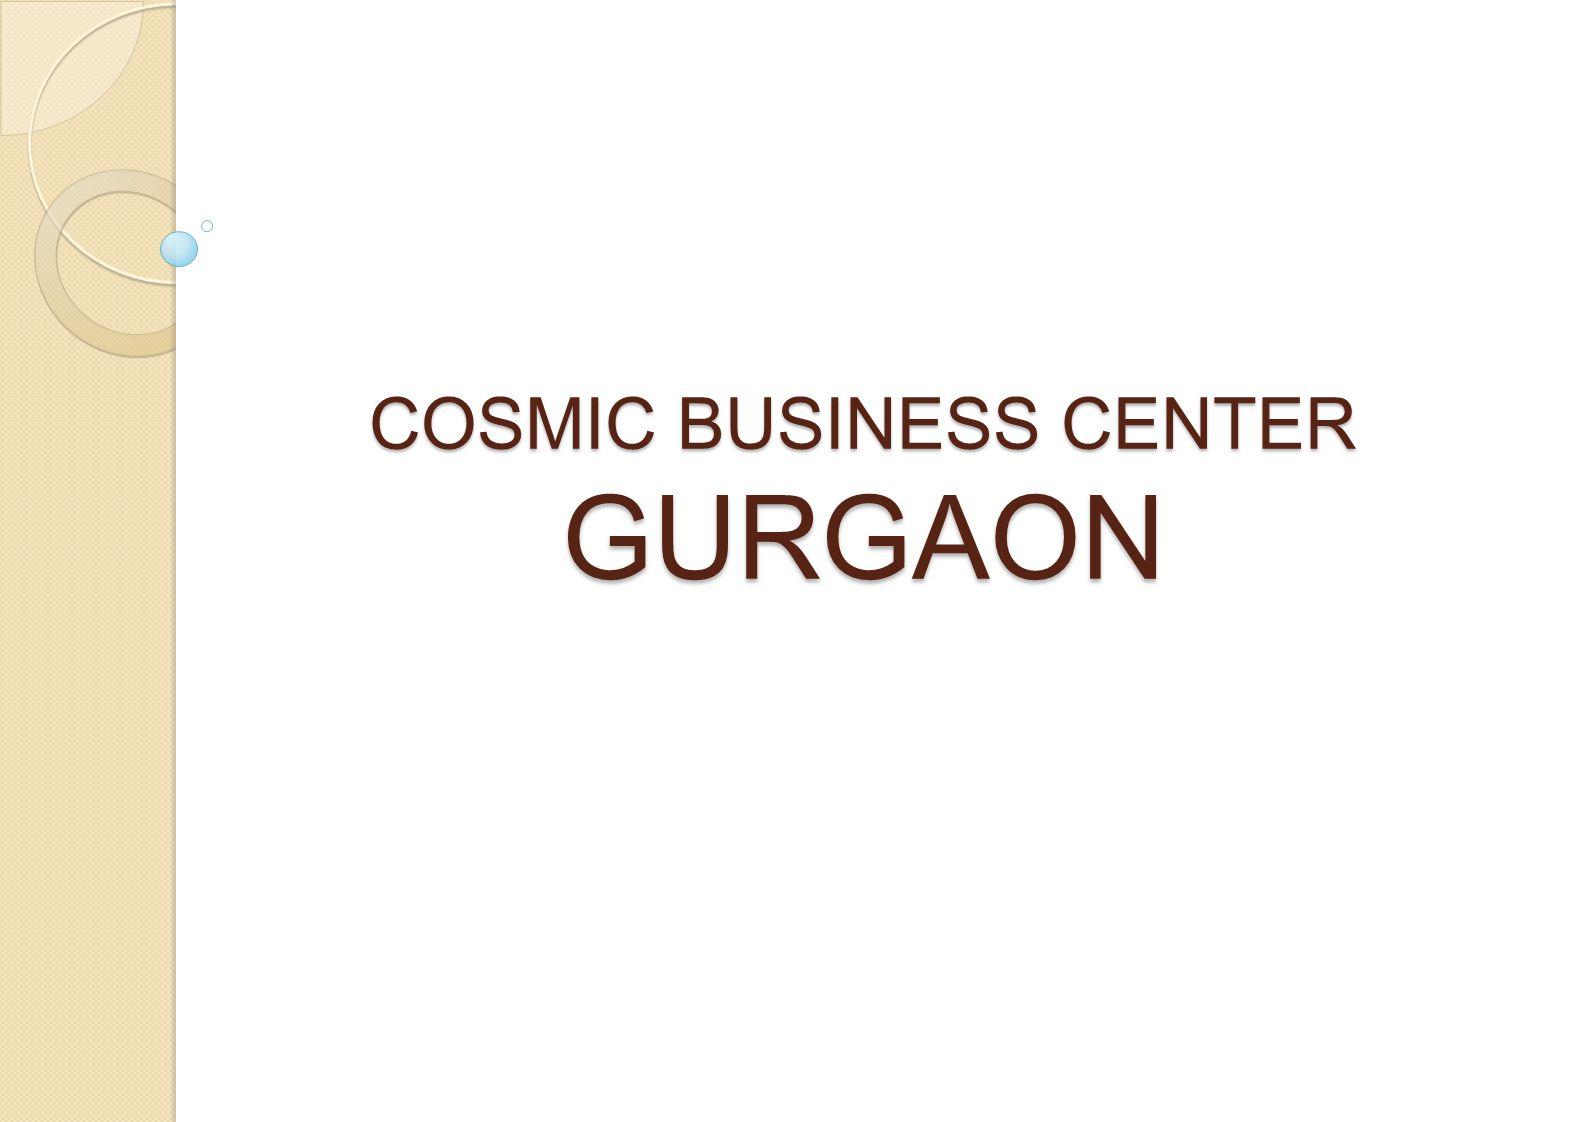 COSMIC BUSINESS CENTER GURGAON